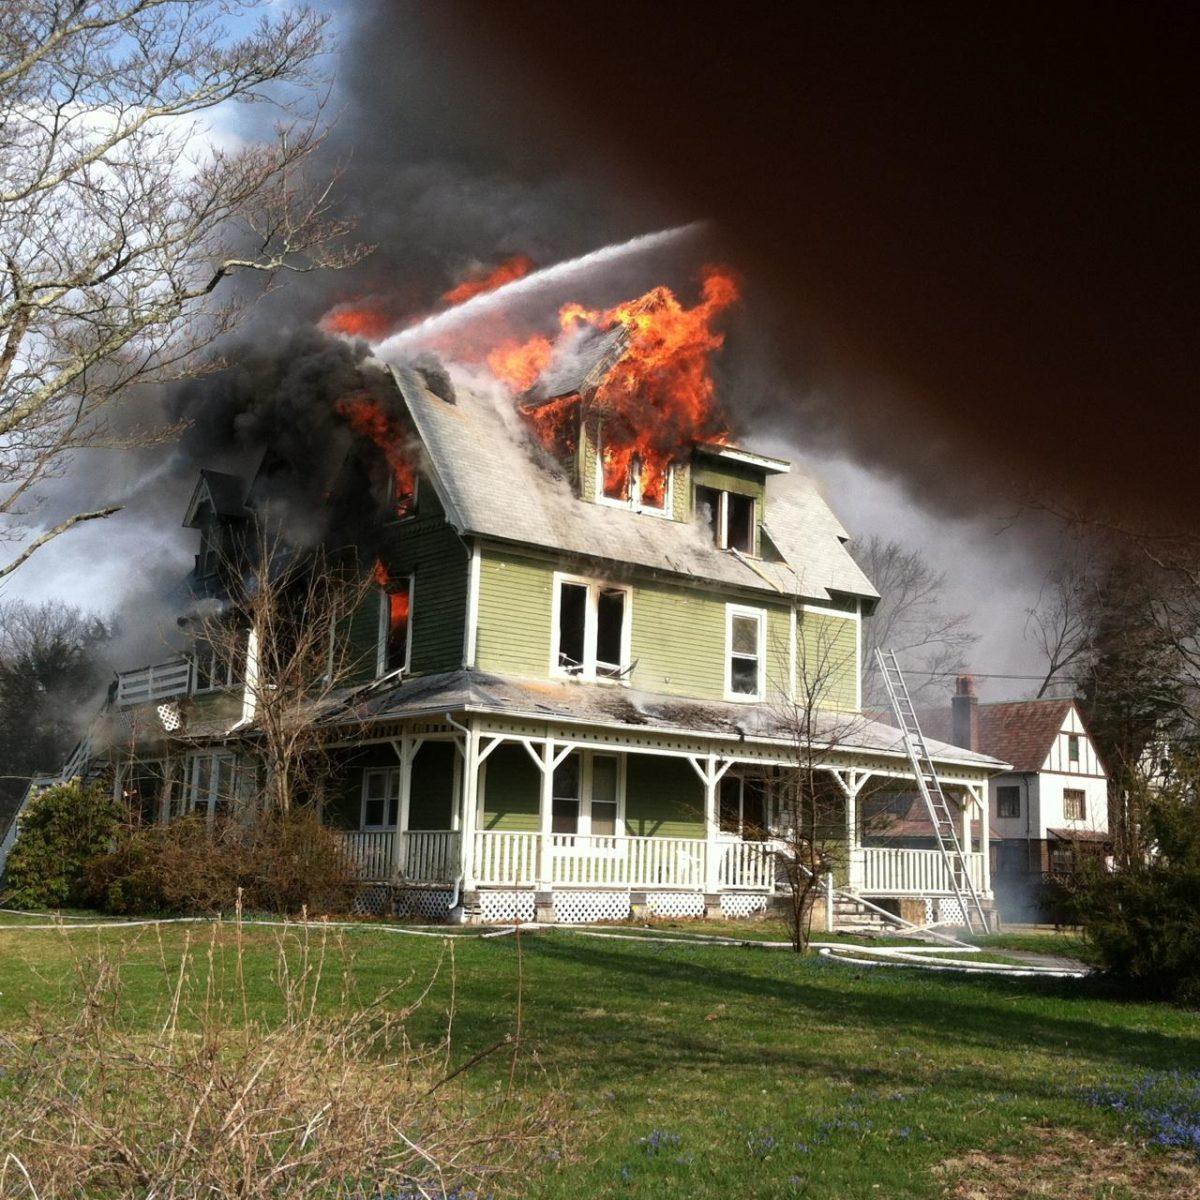 impianto-anticendio-casa-fuoco